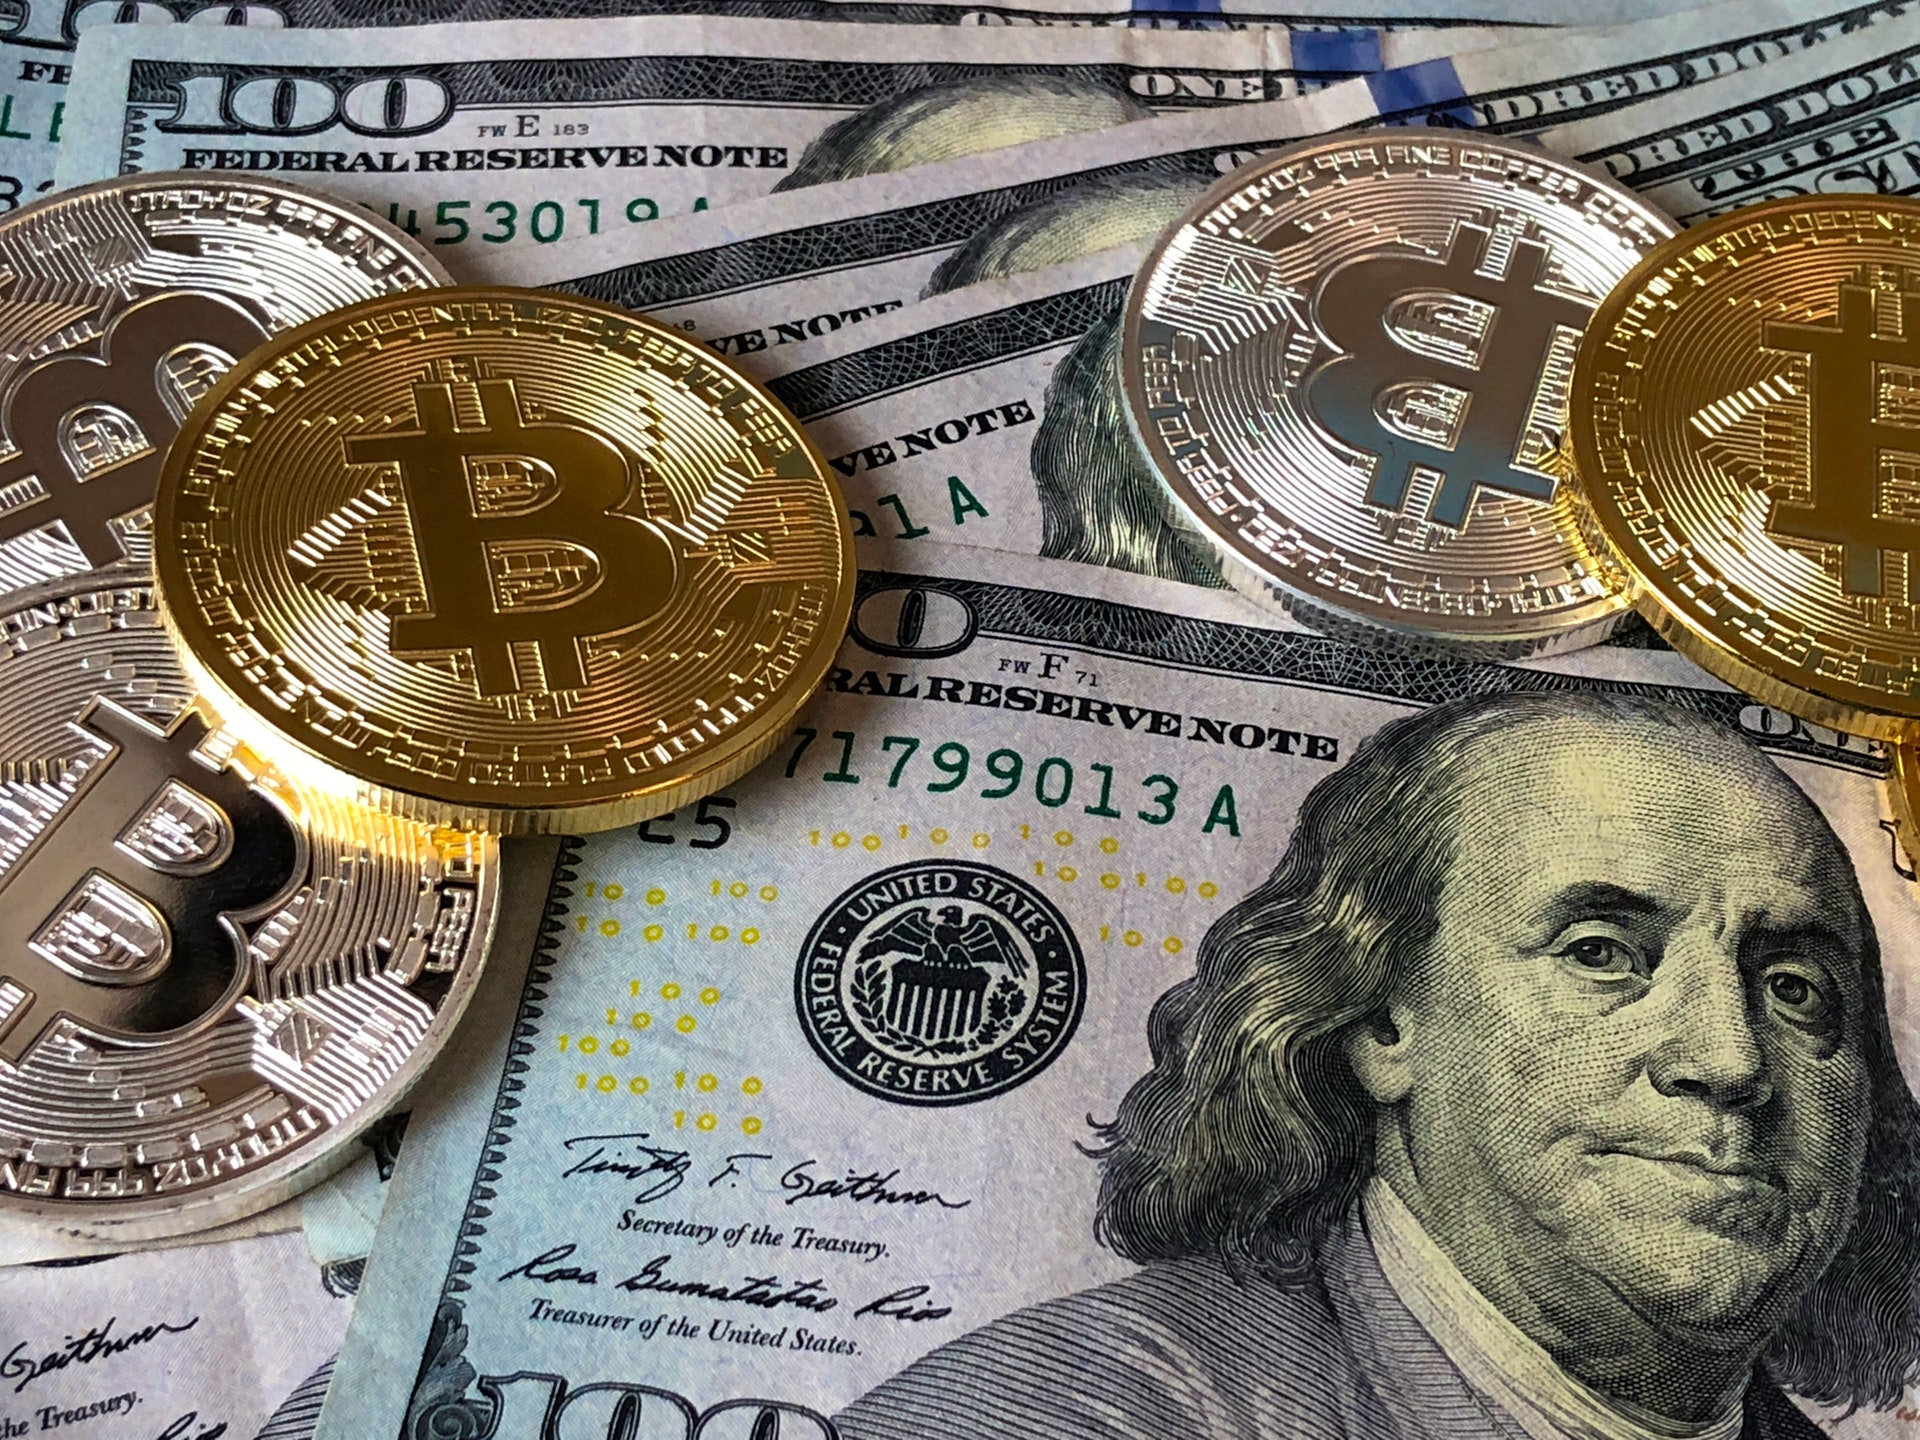 Top 10 Ways to Earn Bitcoin Online in 2021 - BitcoinAfrica.io